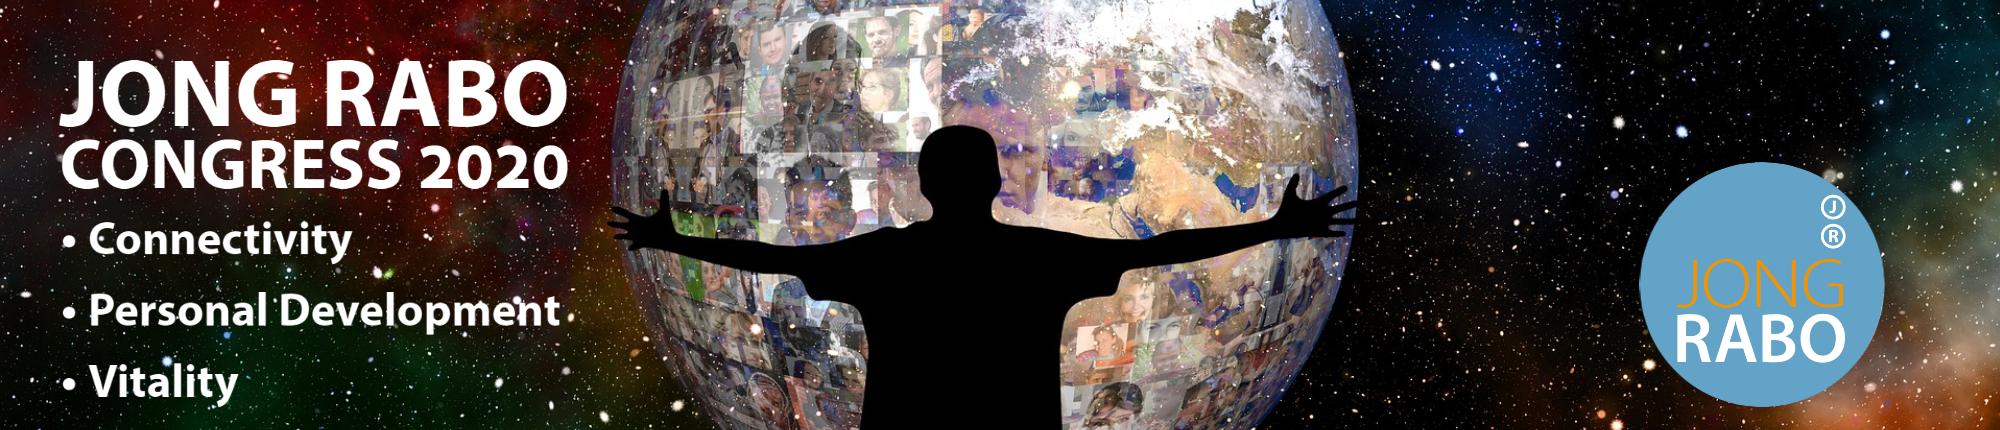 Jong Rabo Congress 2020